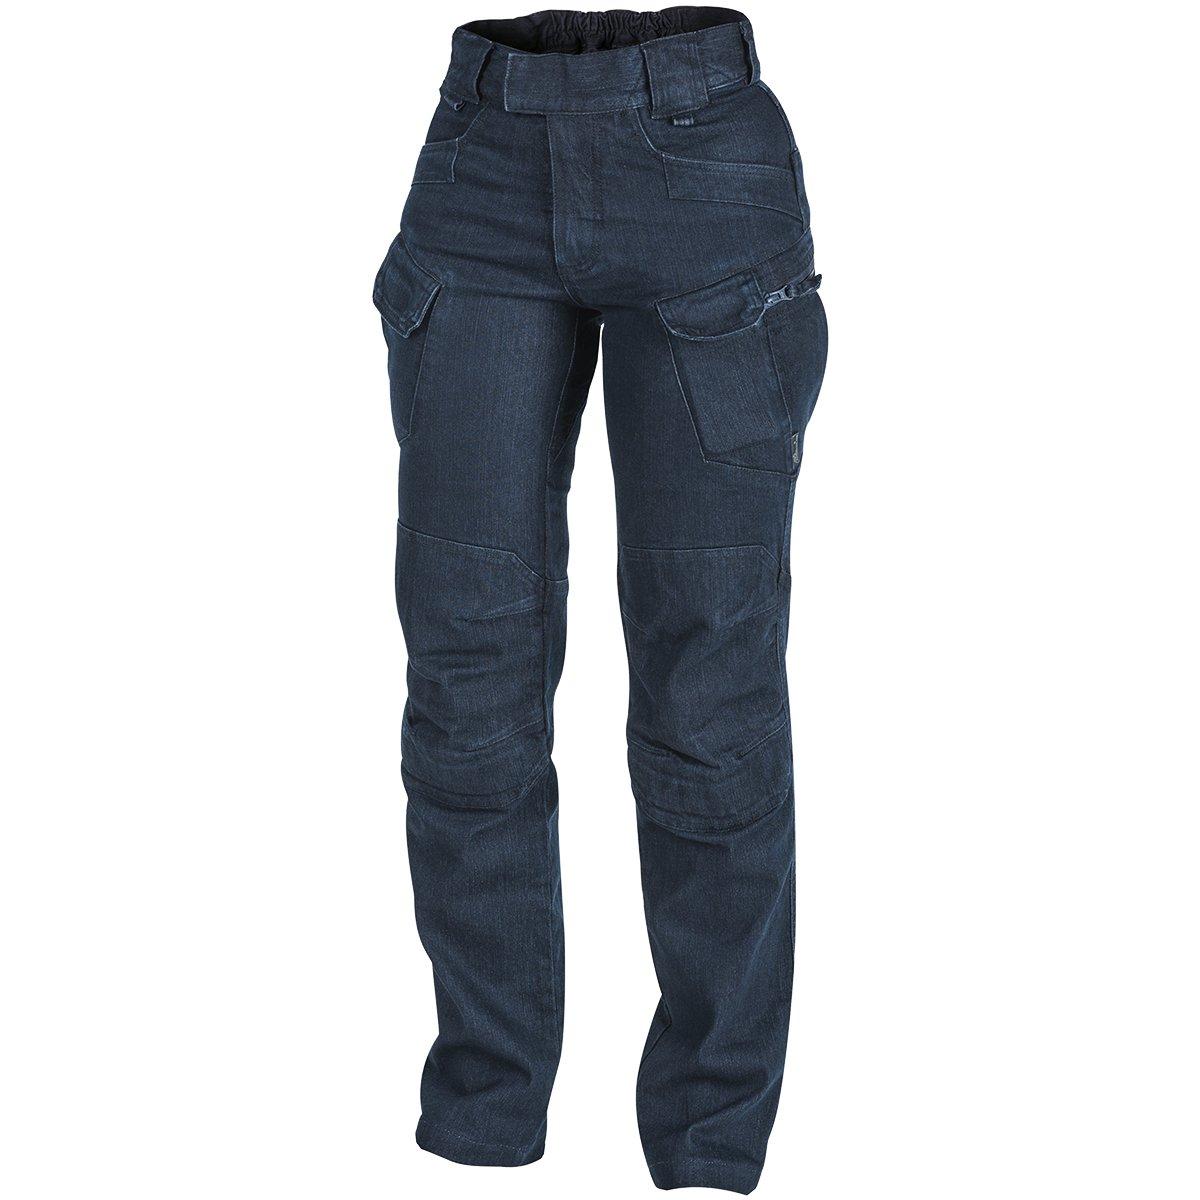 Helikon Women's UTP Trousers Denim Blue HELIKON-TEX